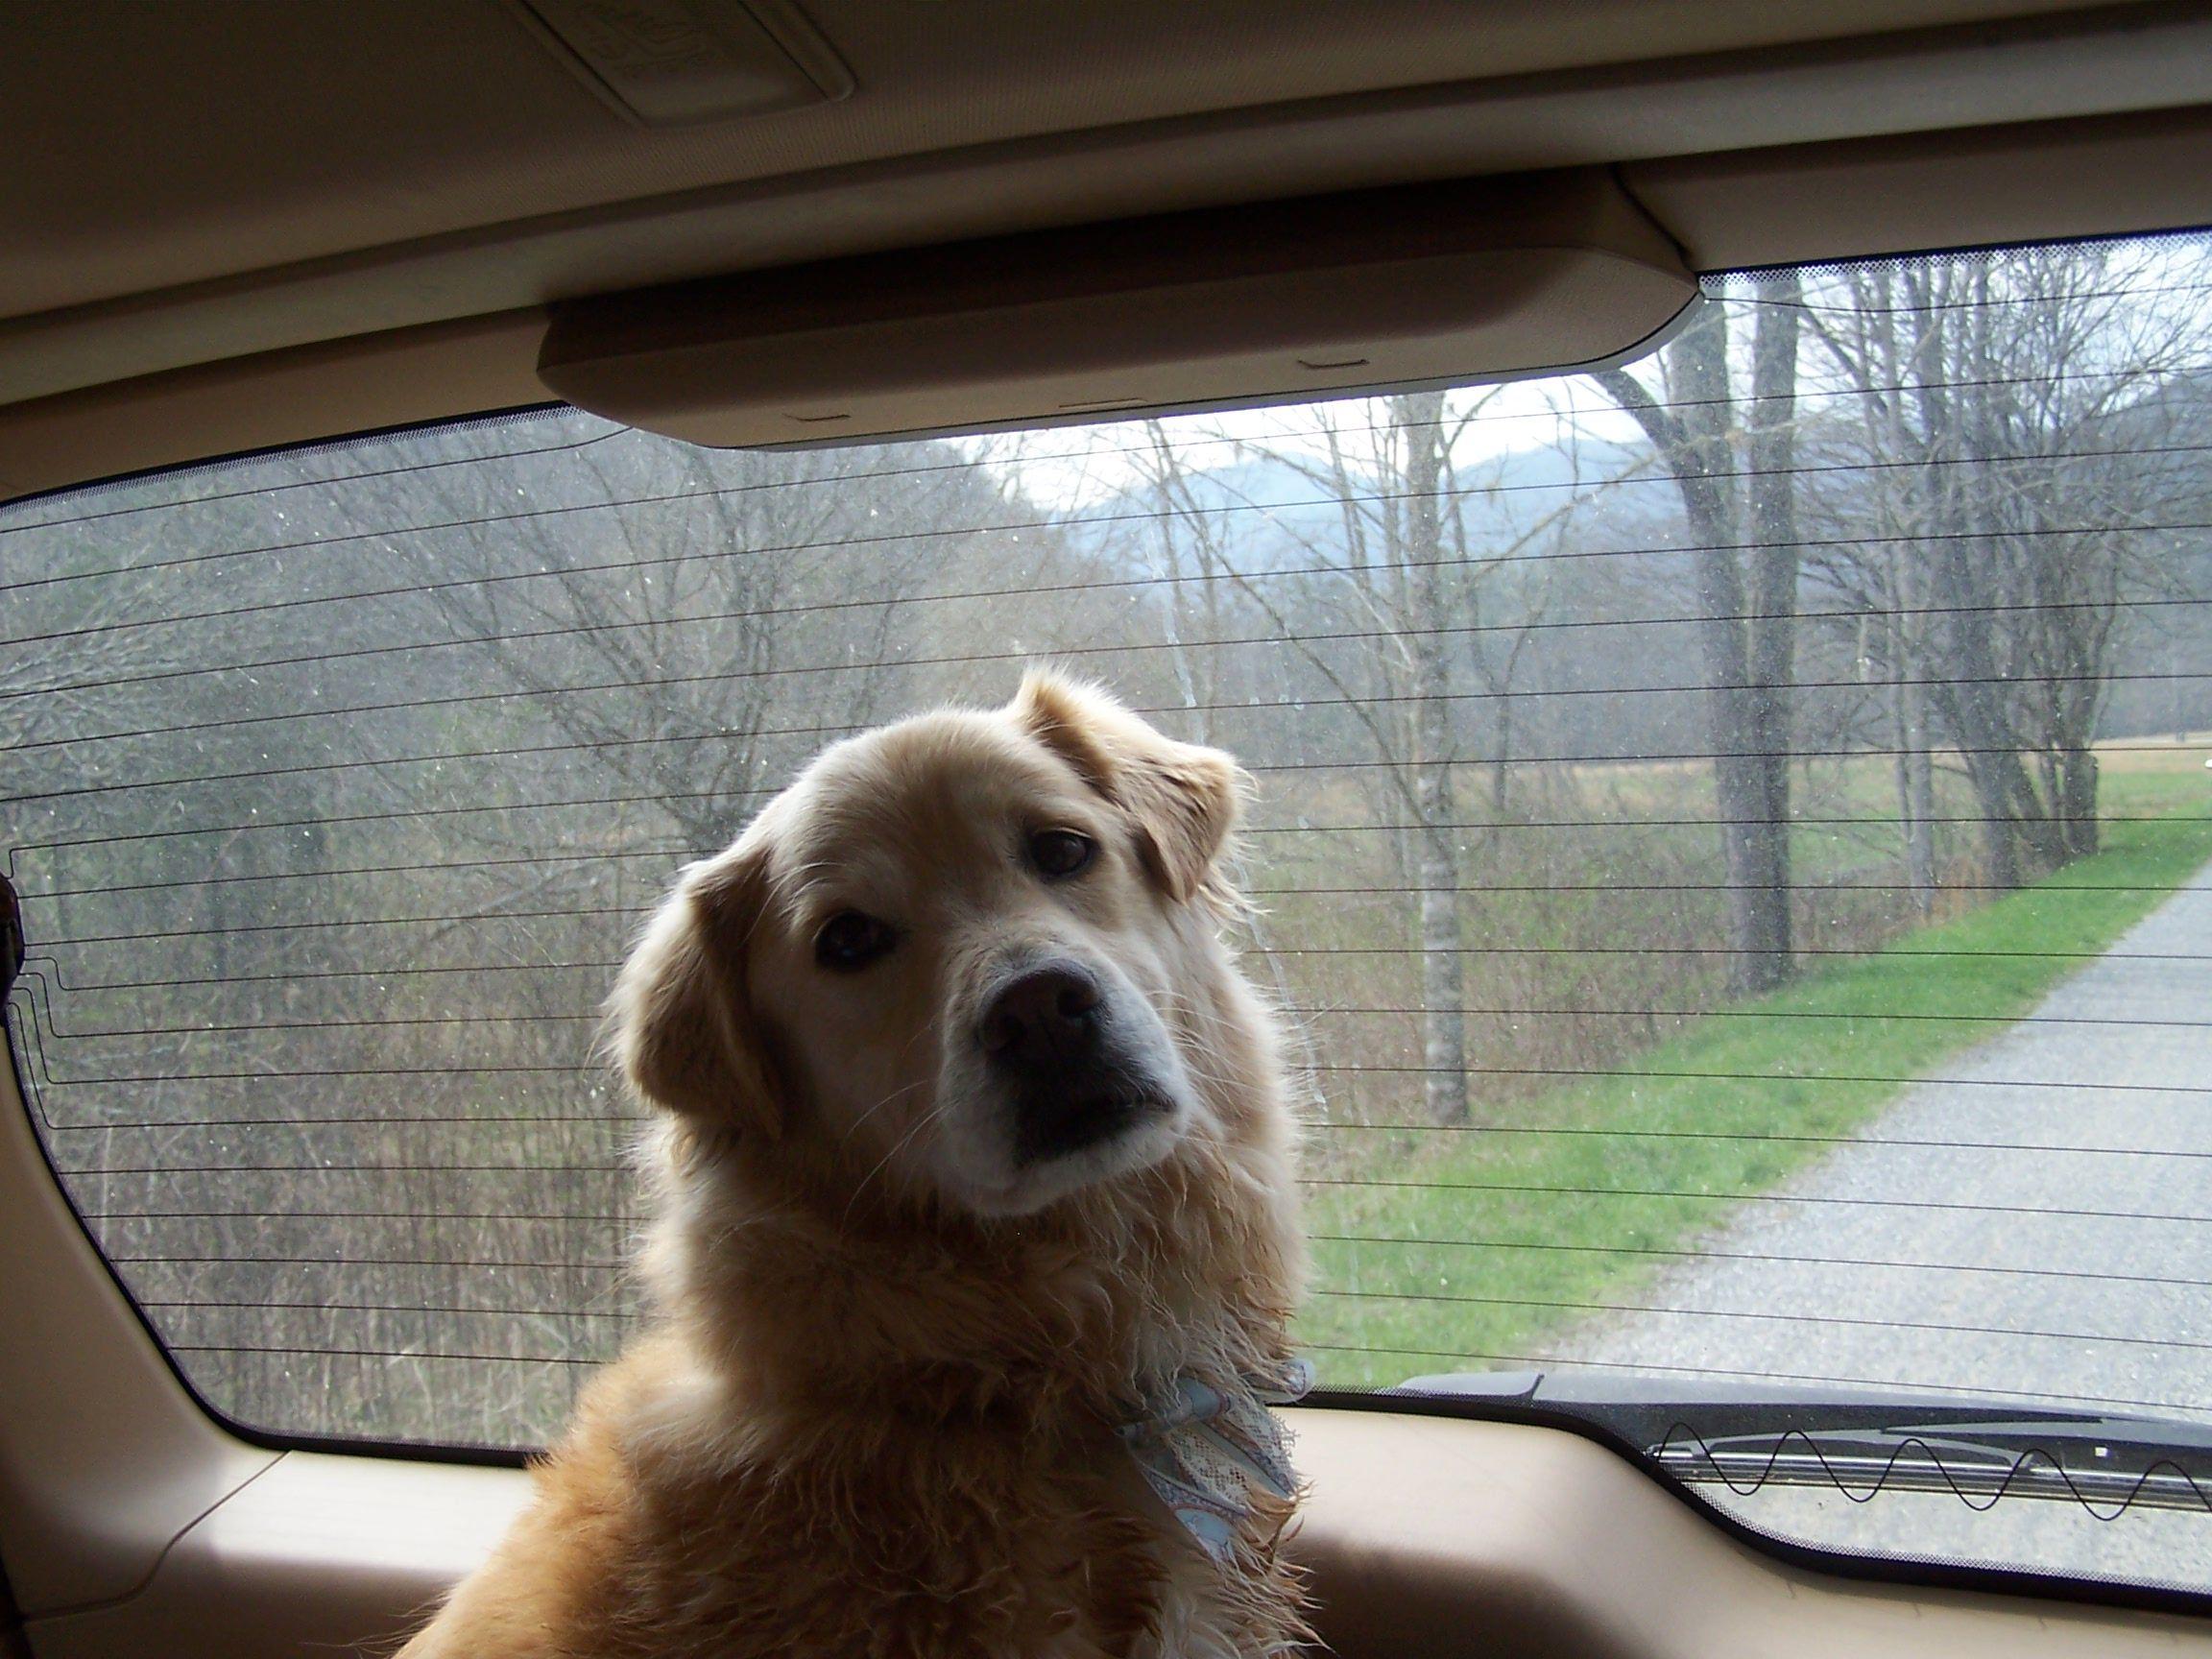 Akc Golden Retriever Puppies Oklahoma - Animal Friends